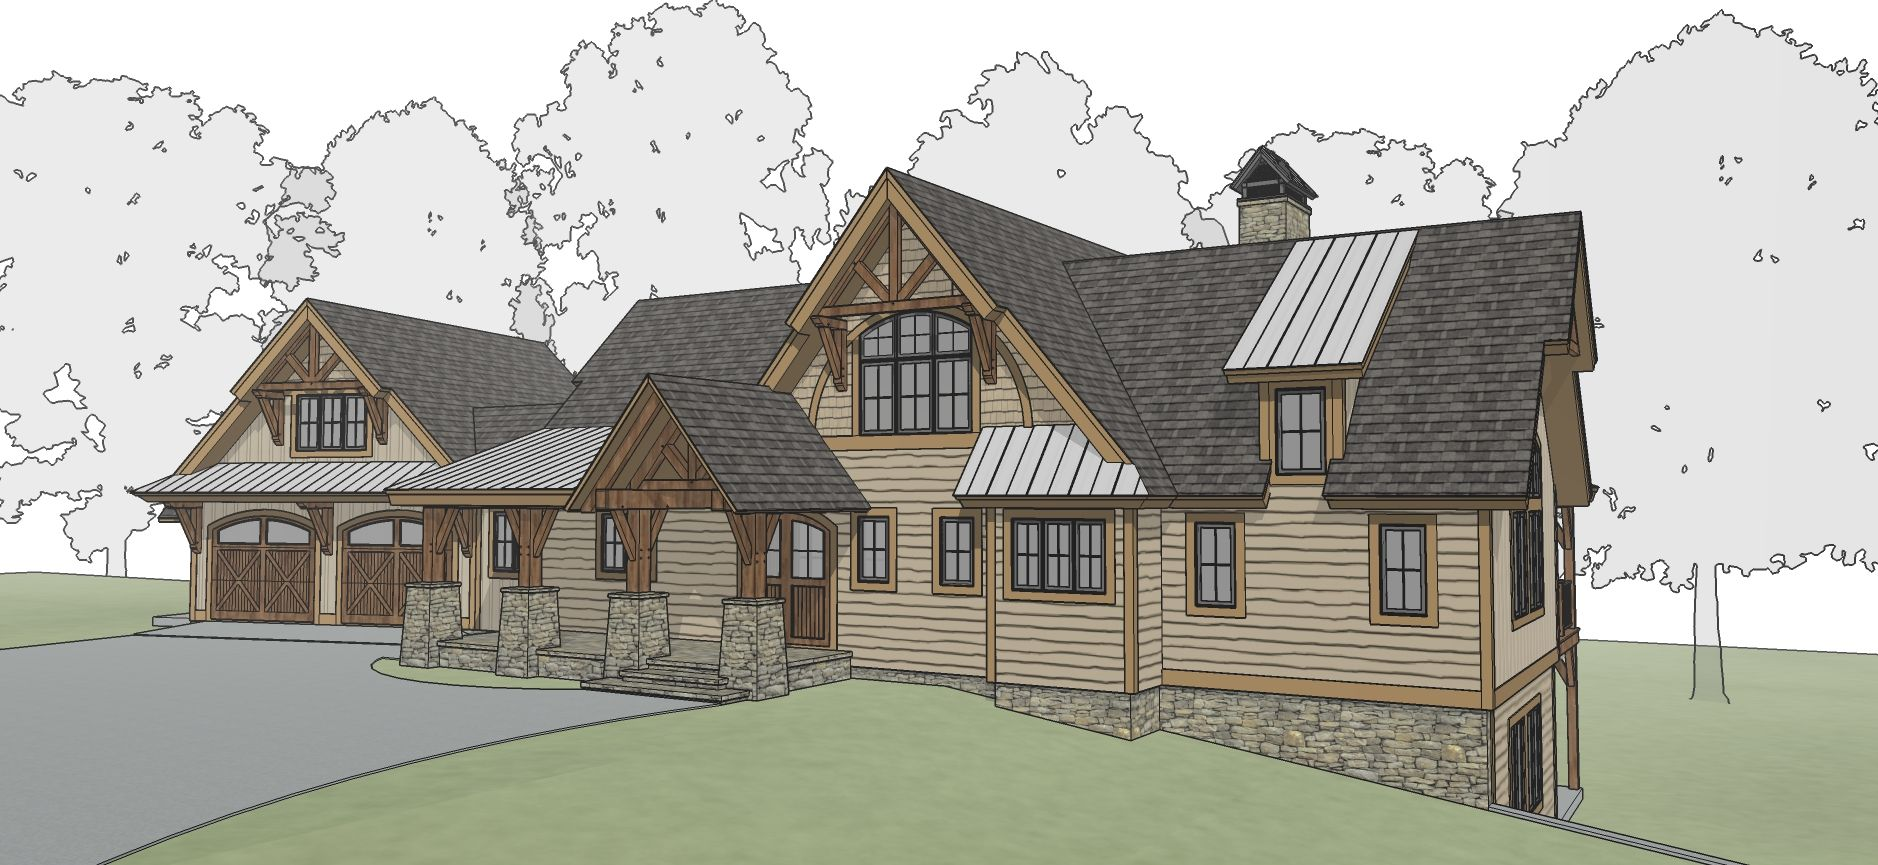 Pine Ridge Timber Frame Floor Plan By Mill Creek